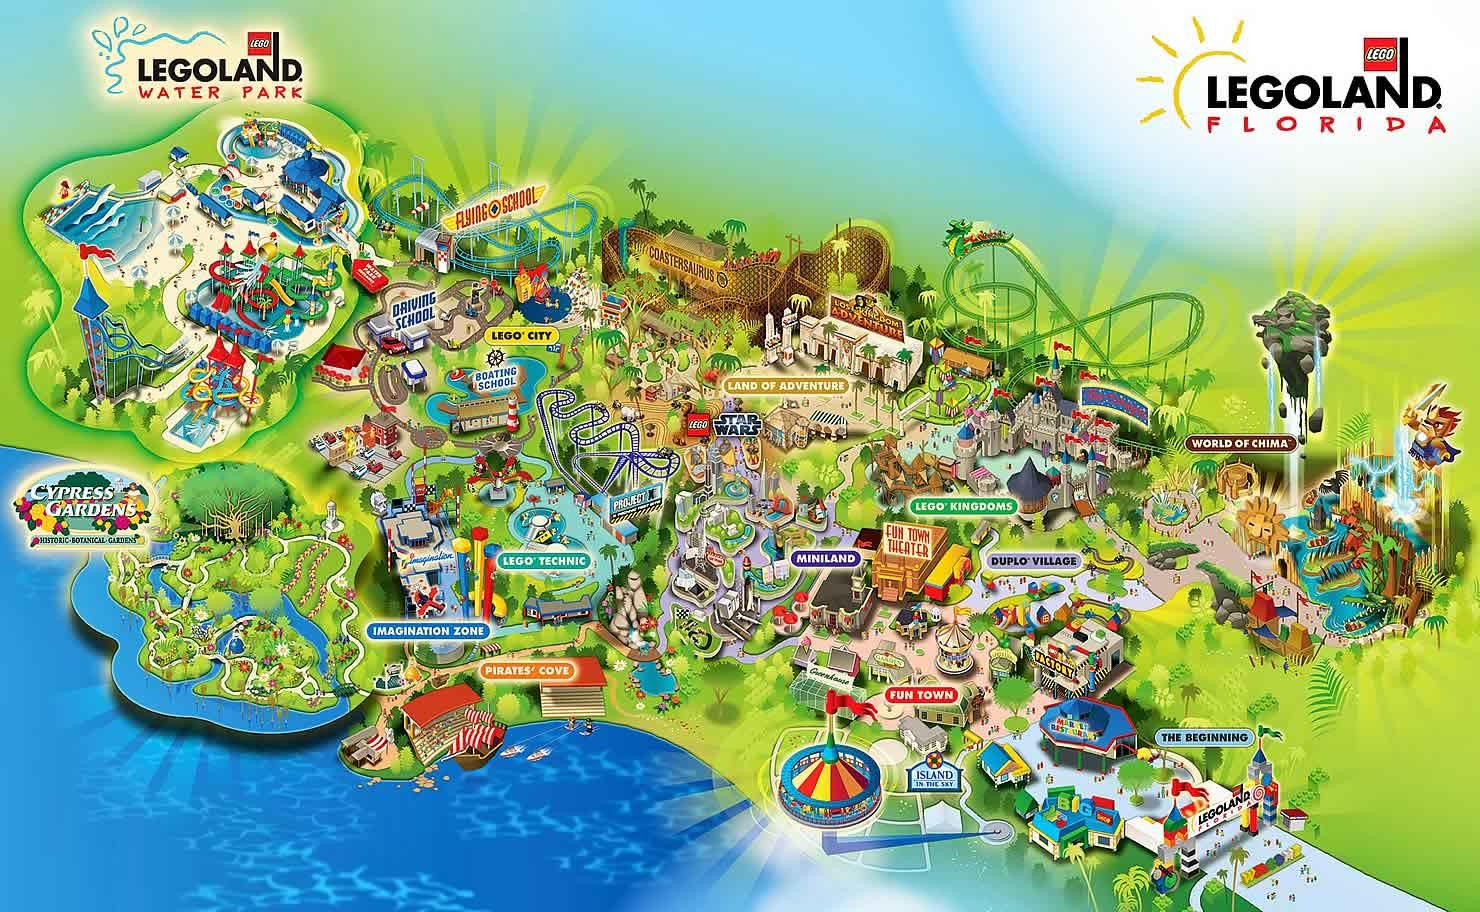 Legoland Usa Florida - Xdata.fr - Legoland Florida Hotel Map